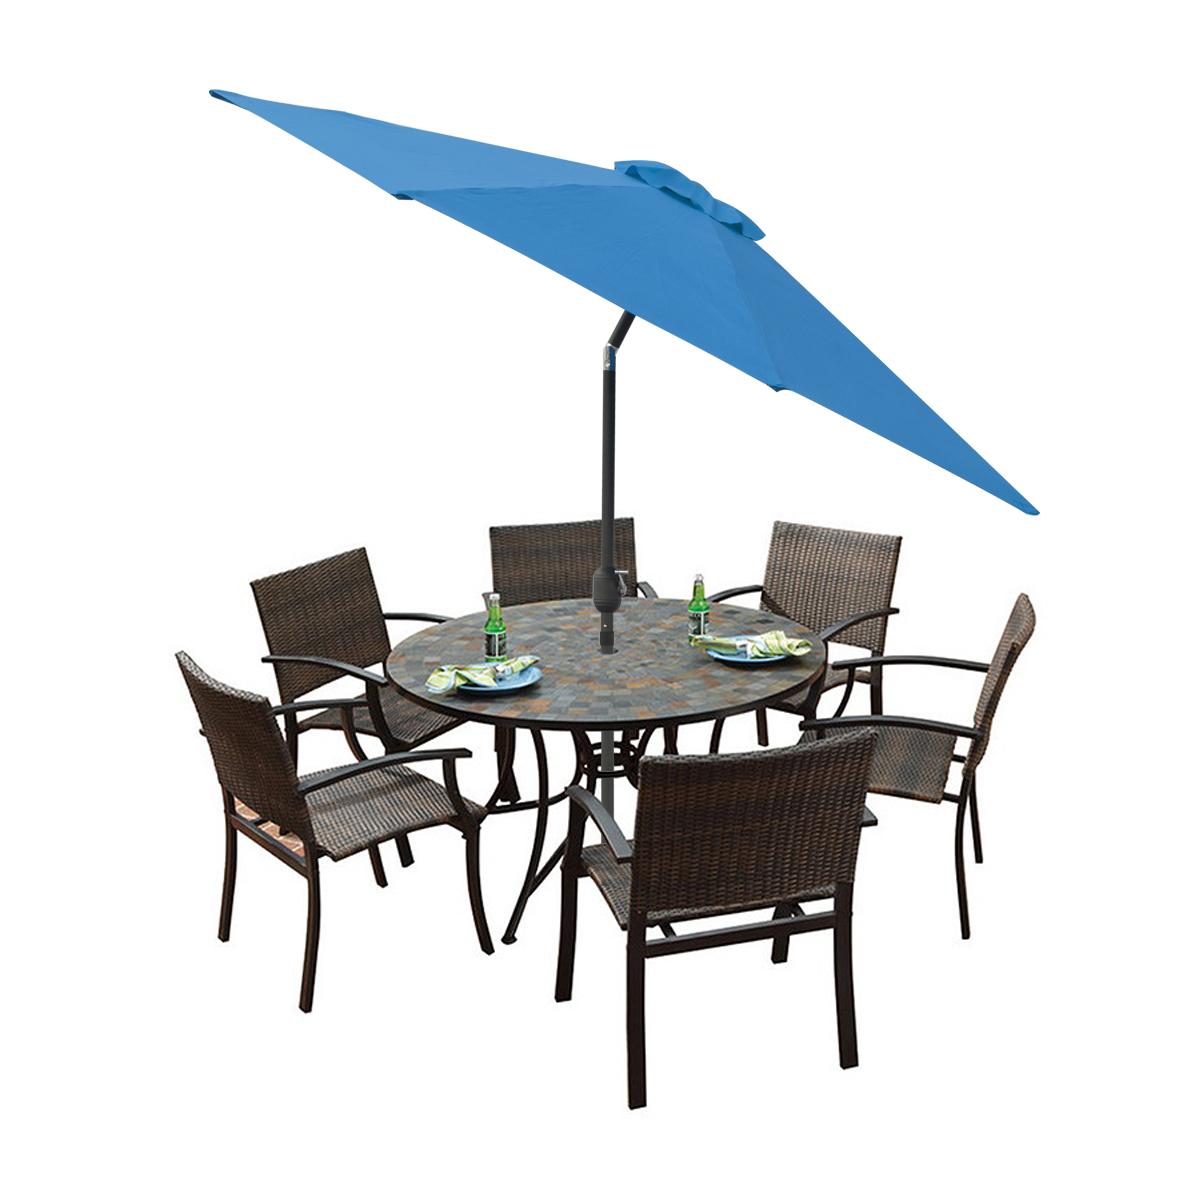 9 39 ft feet patio tilt umbrella crank market aluminium pool for 9 ft garden pool